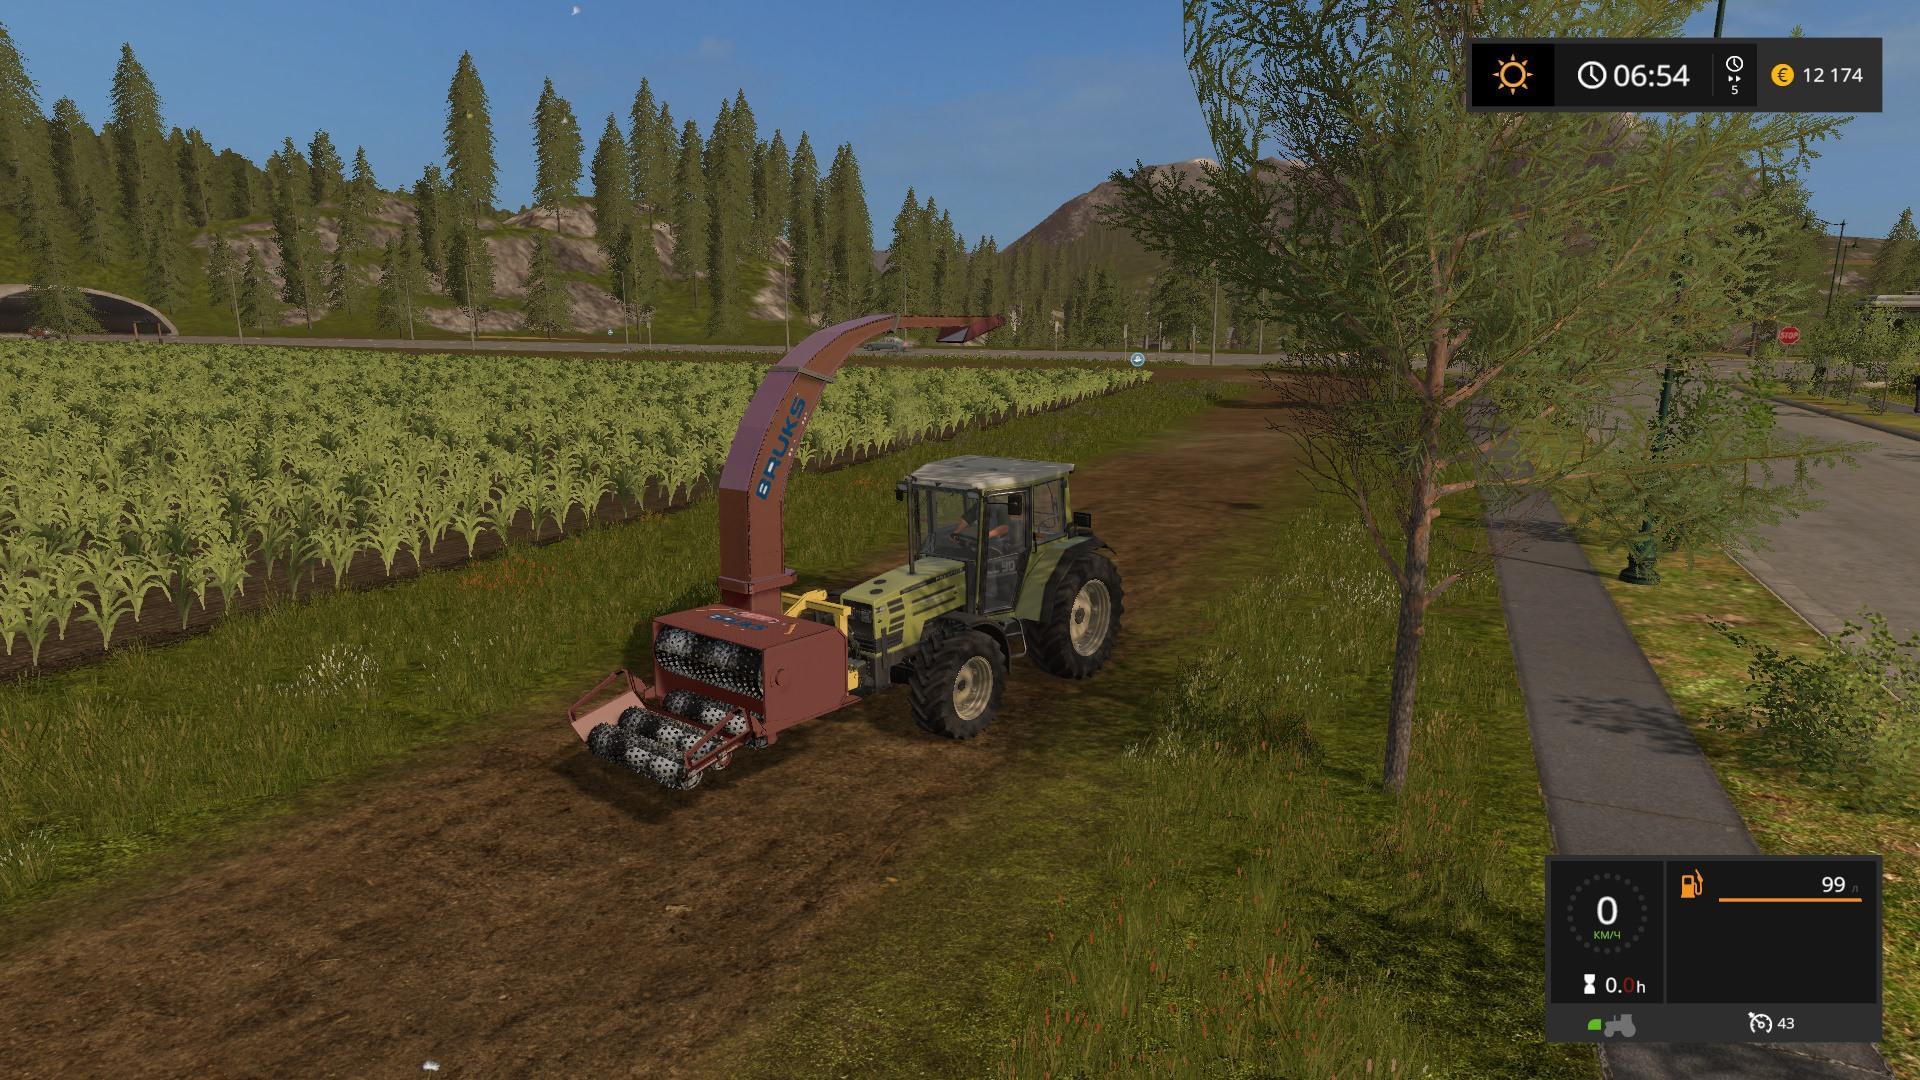 FS17 BRUKS V1.2 - Farming simulator 2019 / 2017 / 2015 Mod